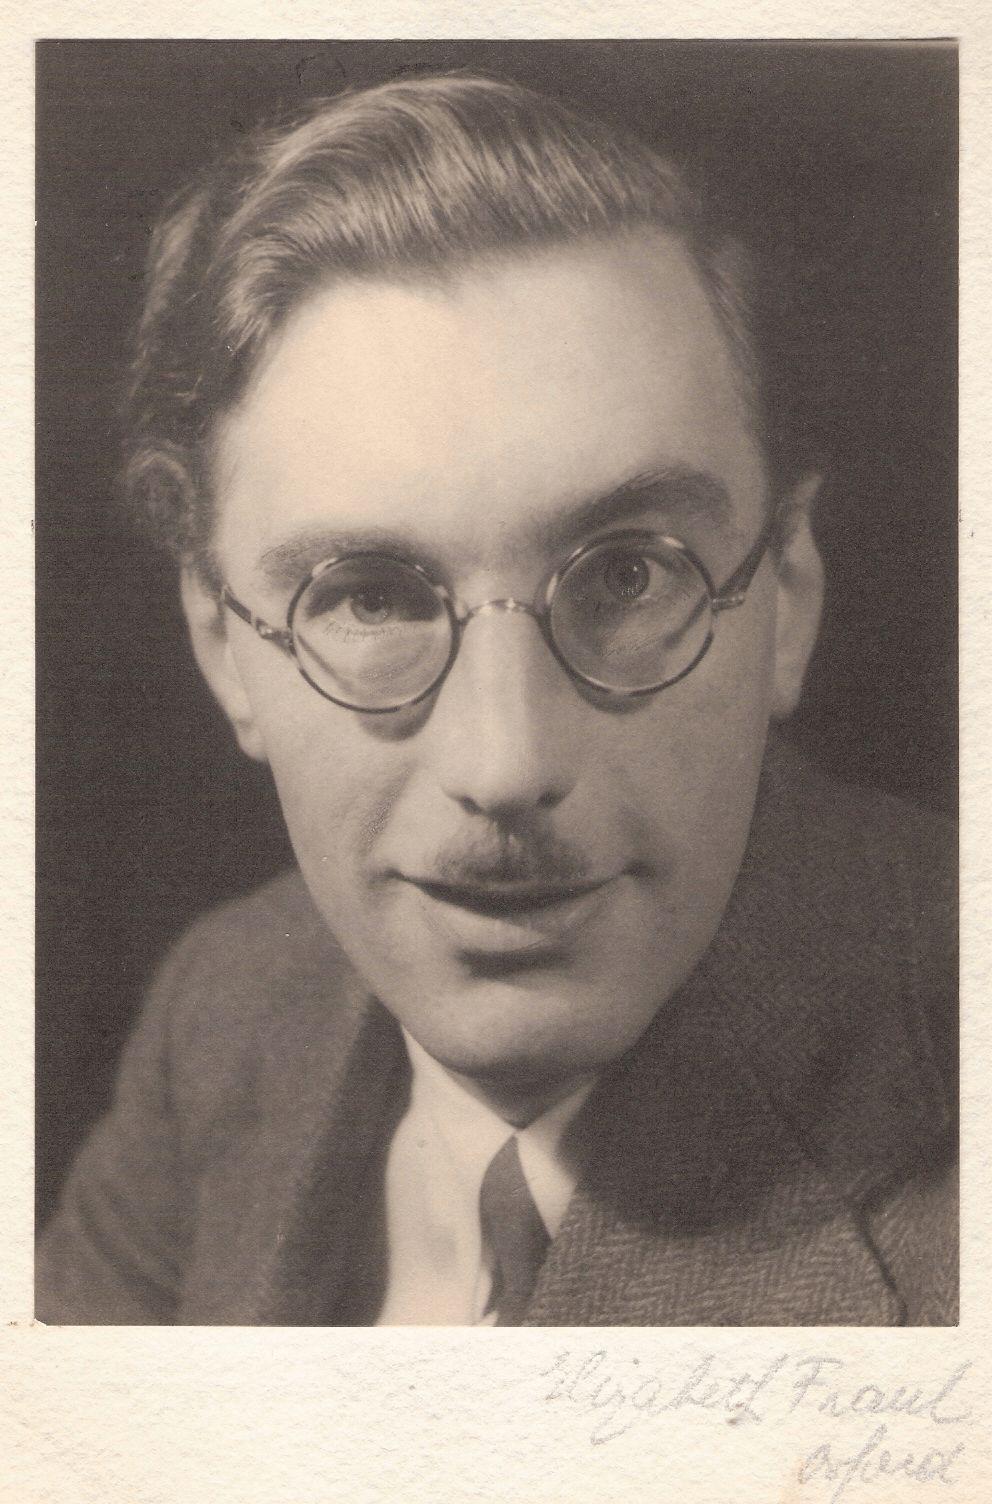 Ronald James Marsh